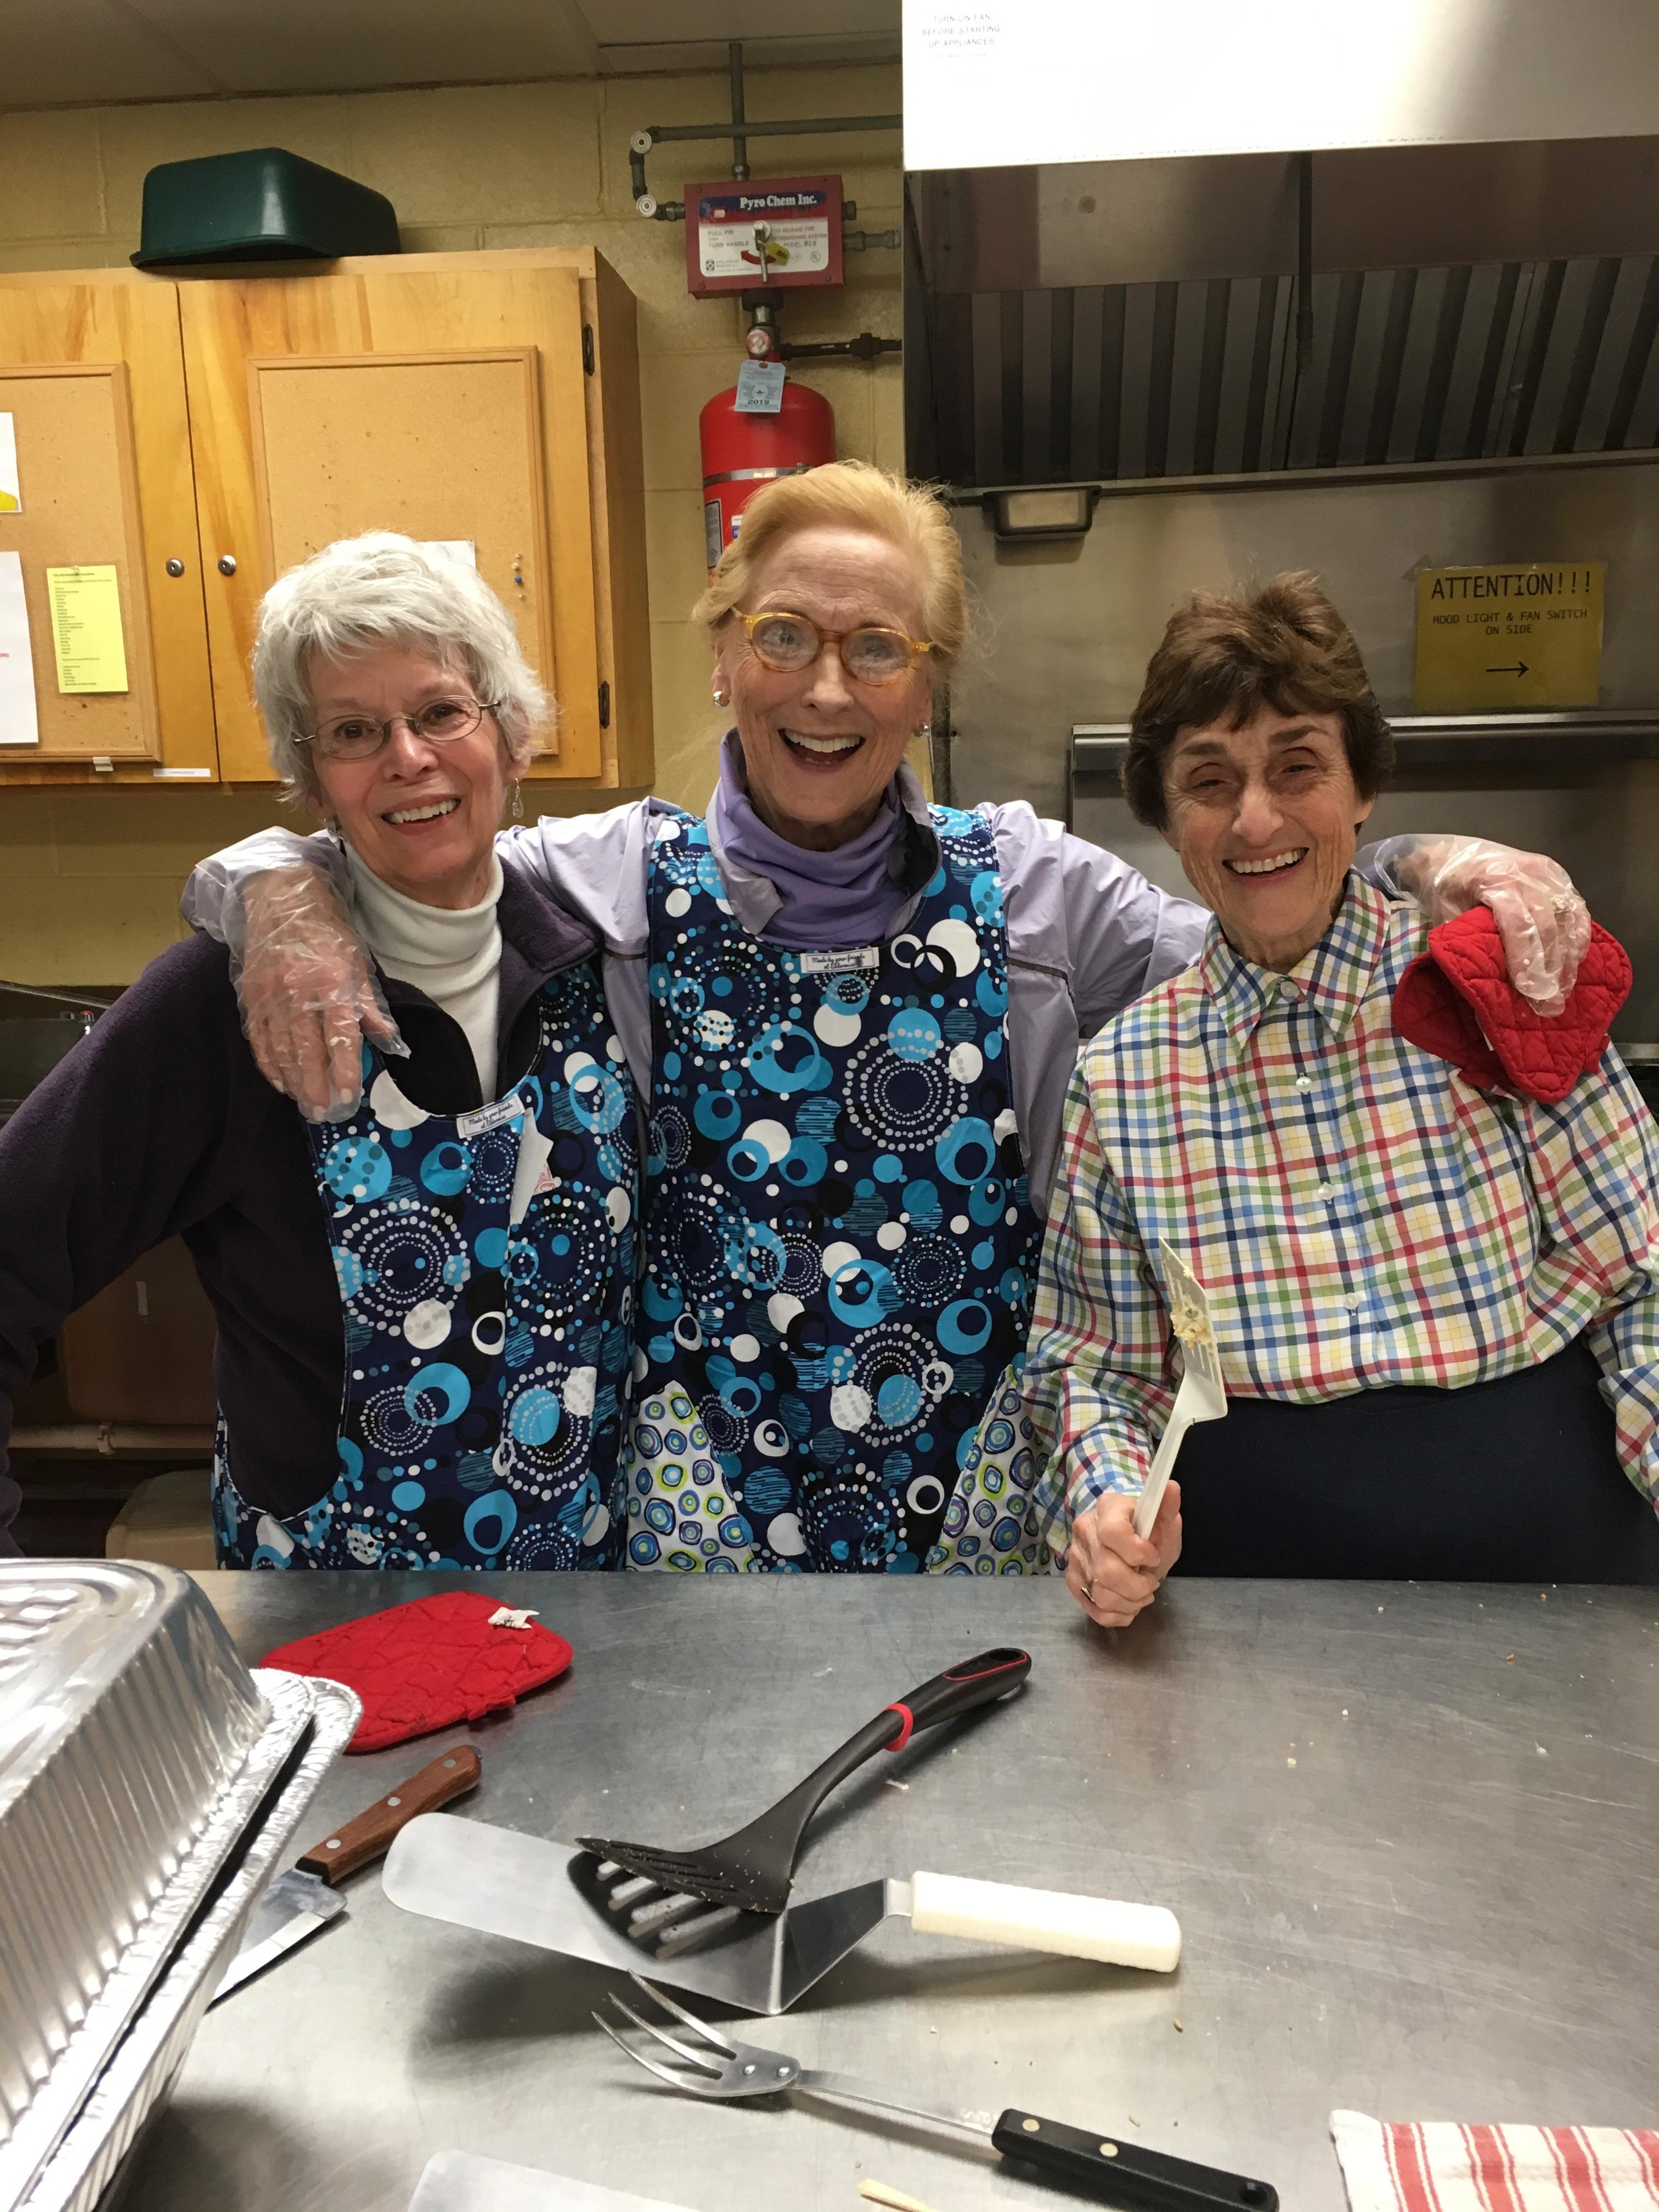 Having fun in the kitchen